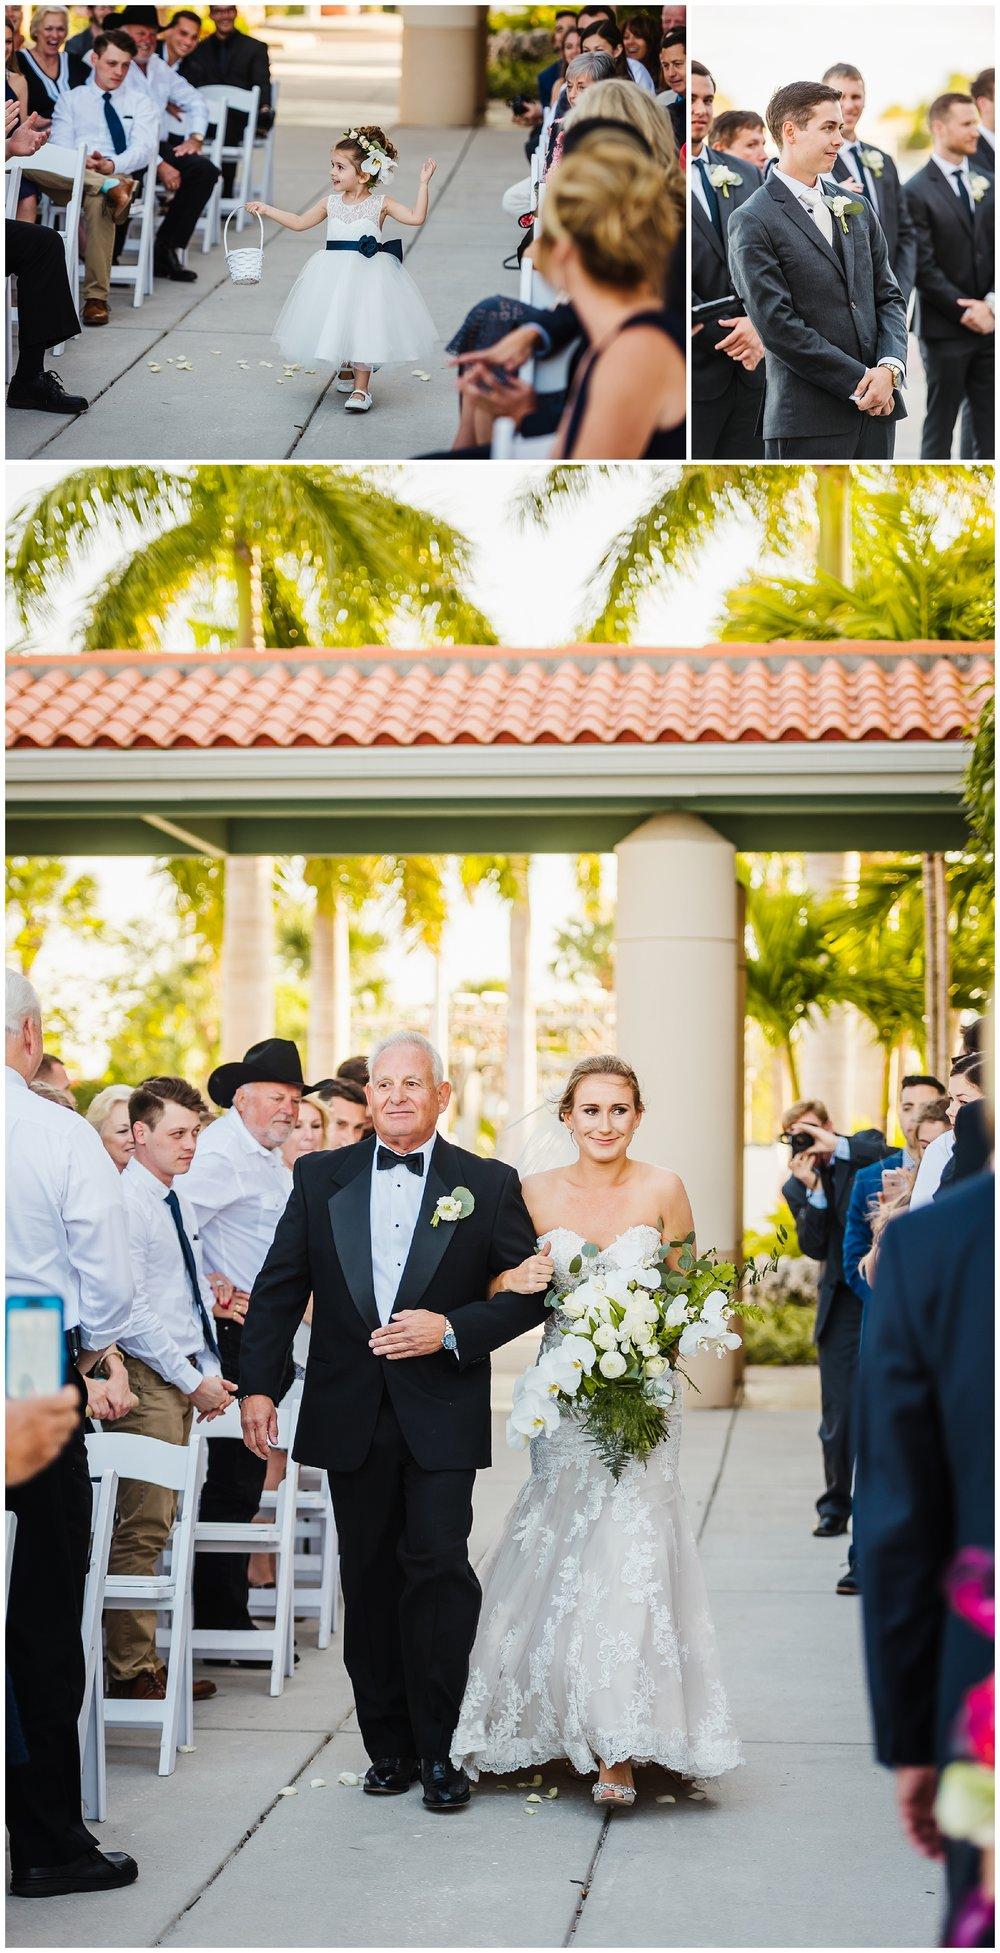 Tampa-wedding-photographer-bella-fleur-orchid-boquet-rsvb-events_0016.jpg